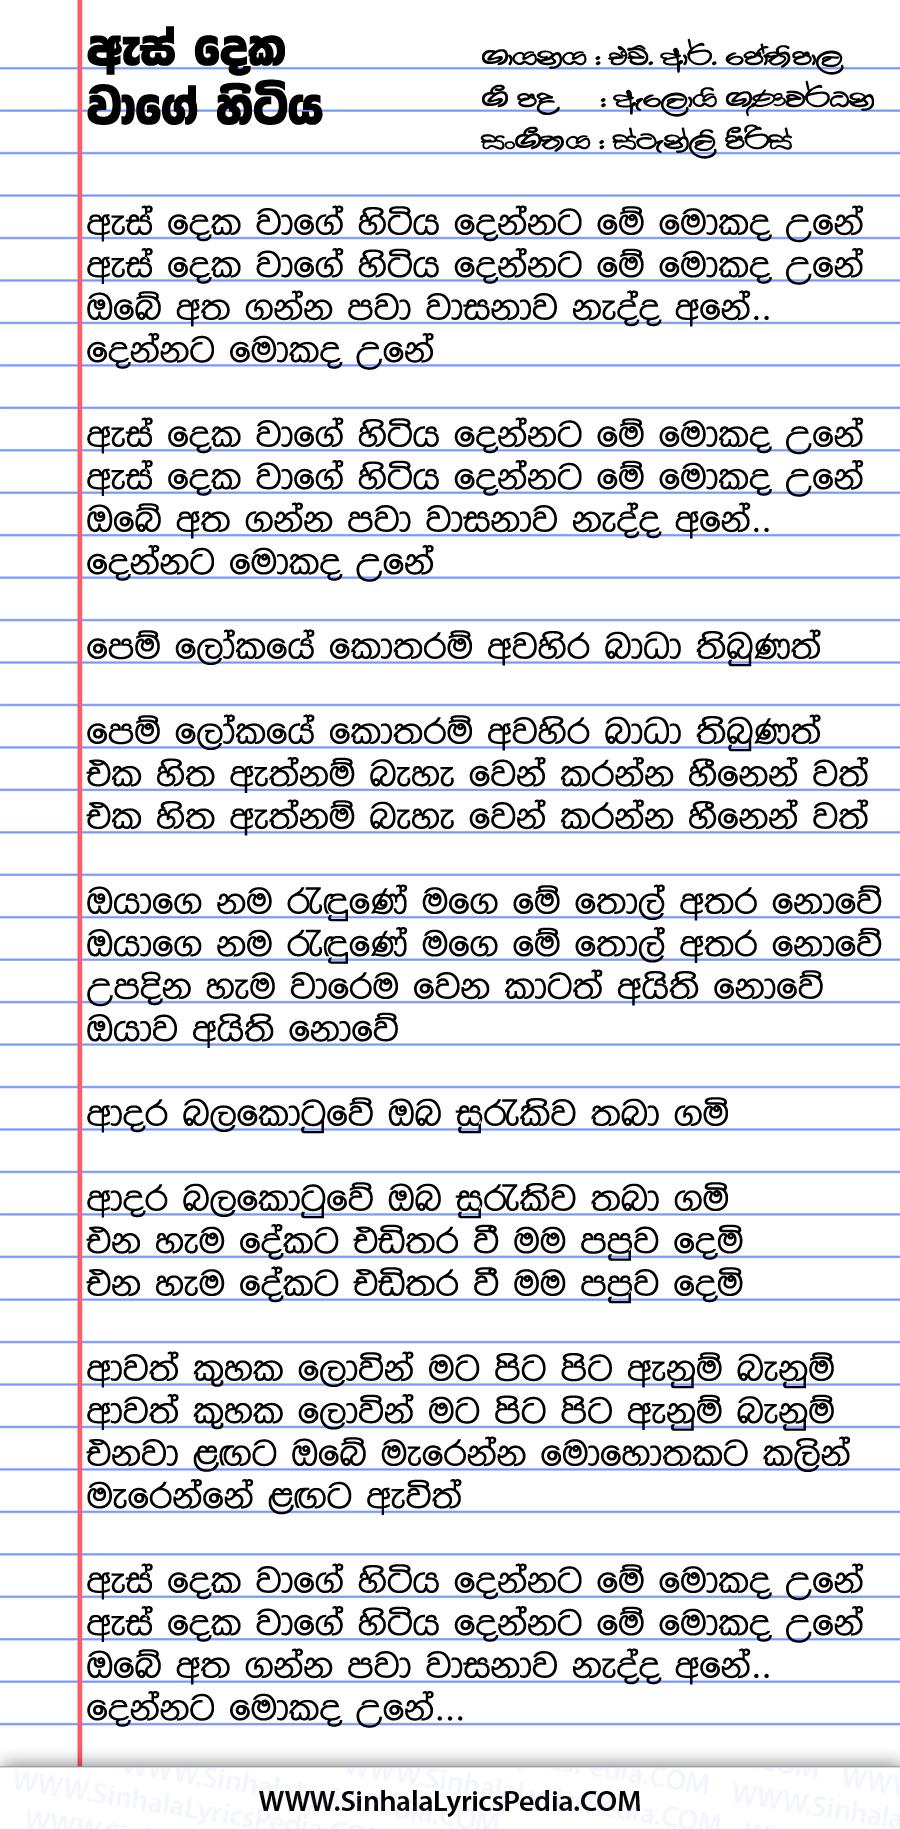 As Deka Wage Hitiya Dennata Me Mokada Une Song Lyrics